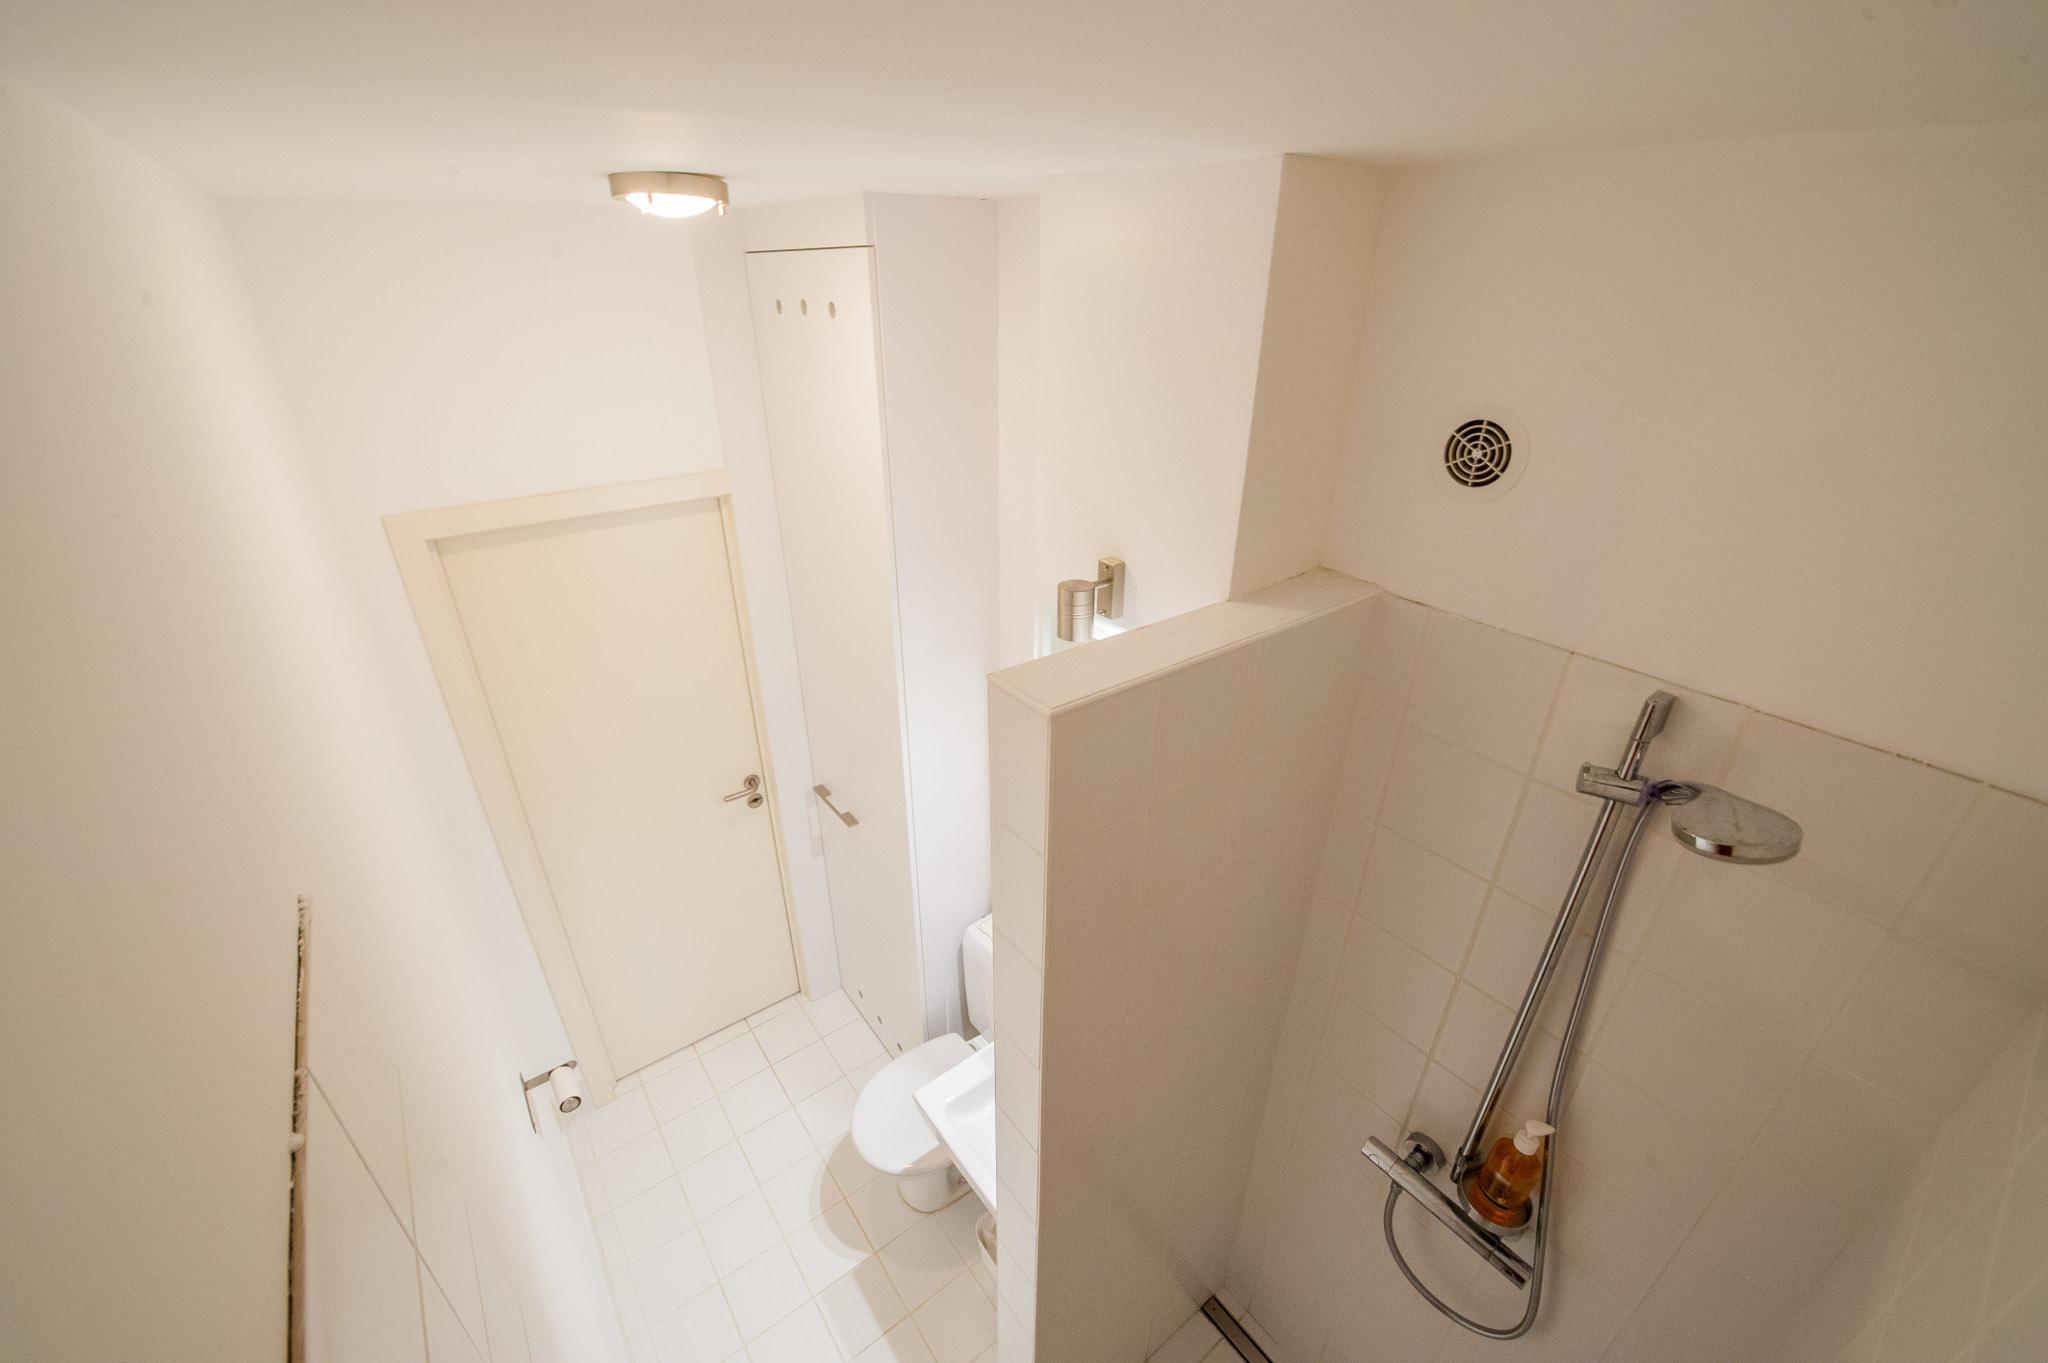 Petite salle-de-douche